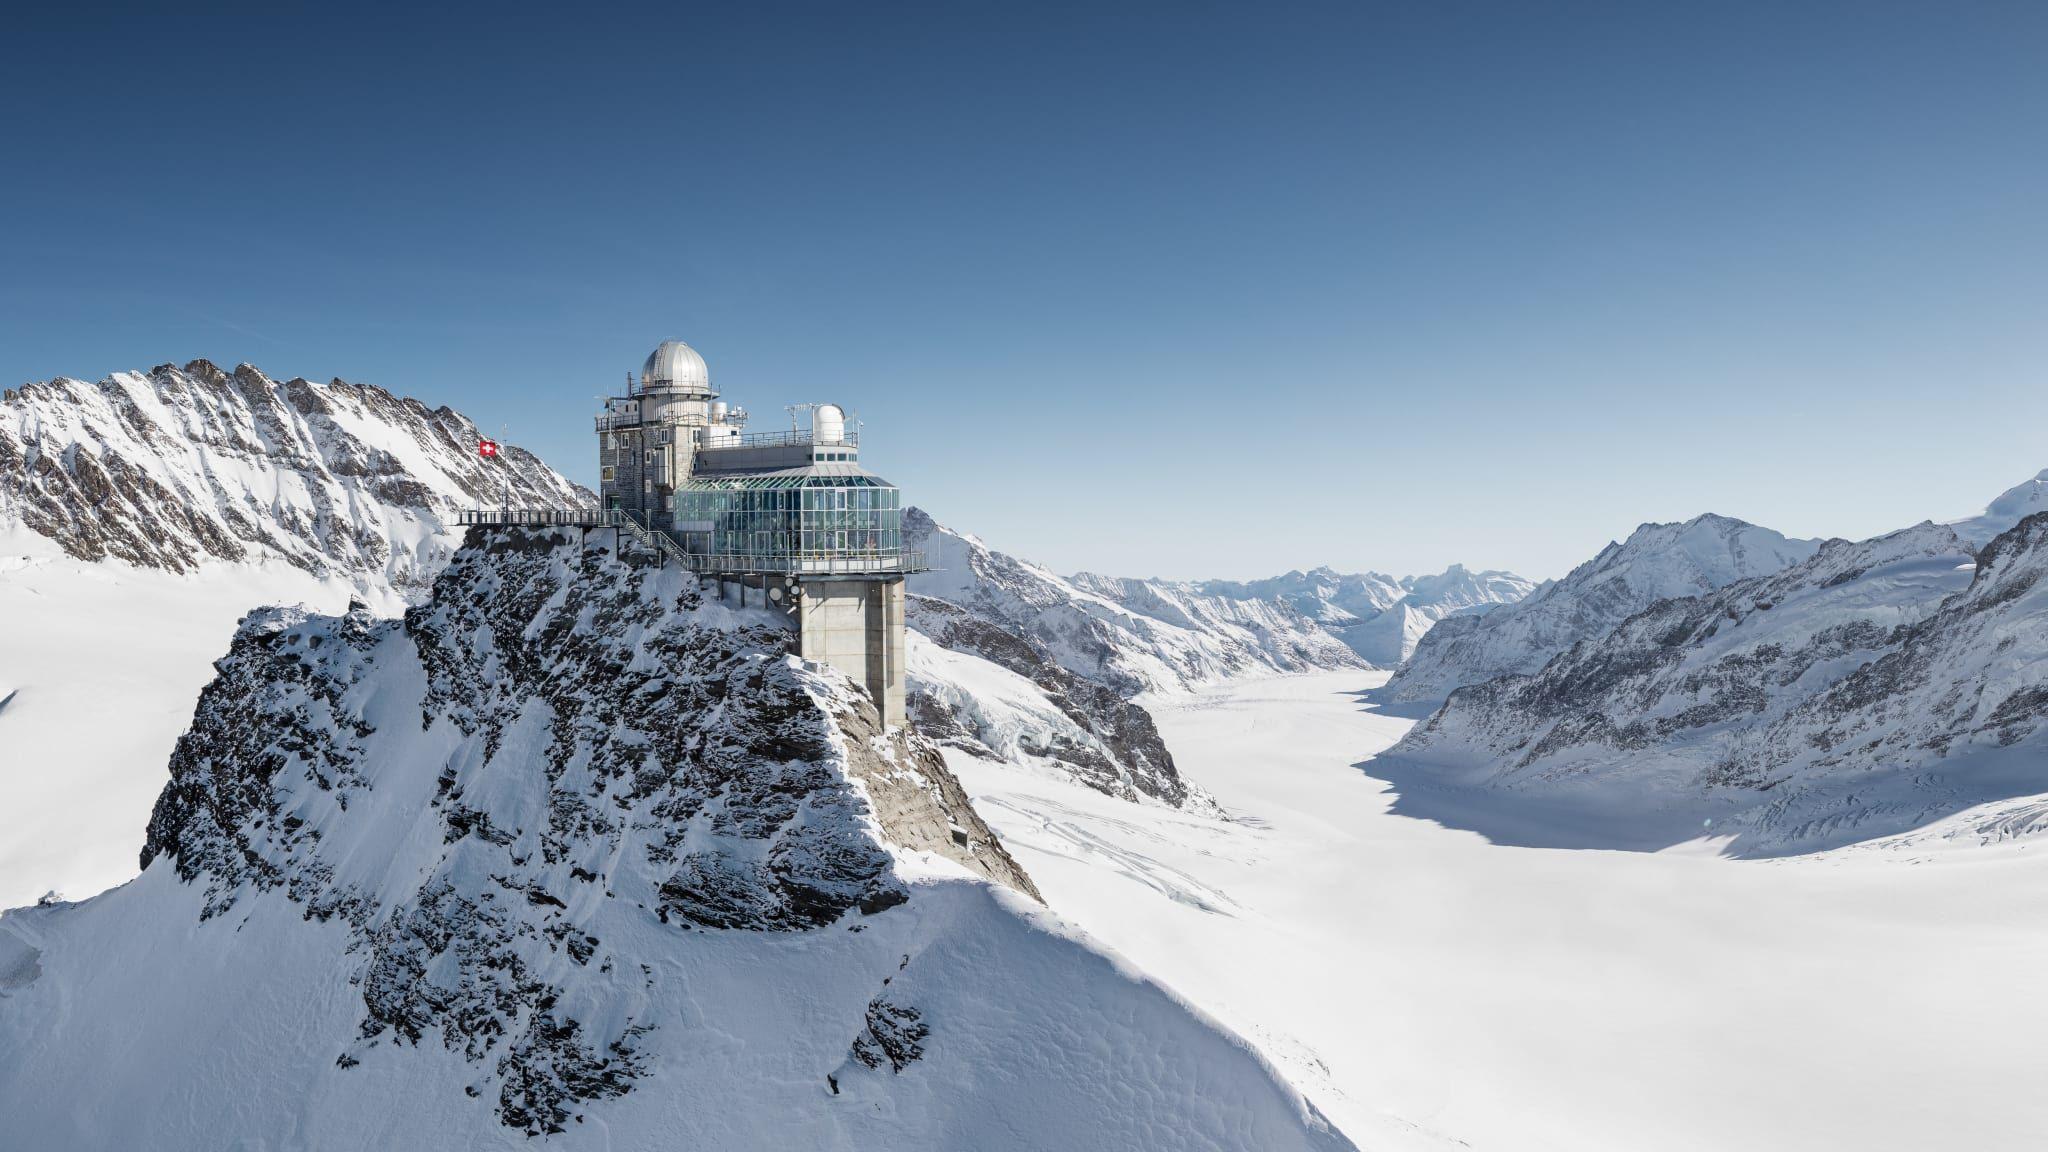 Windwarnung Jungfraujochbahnen